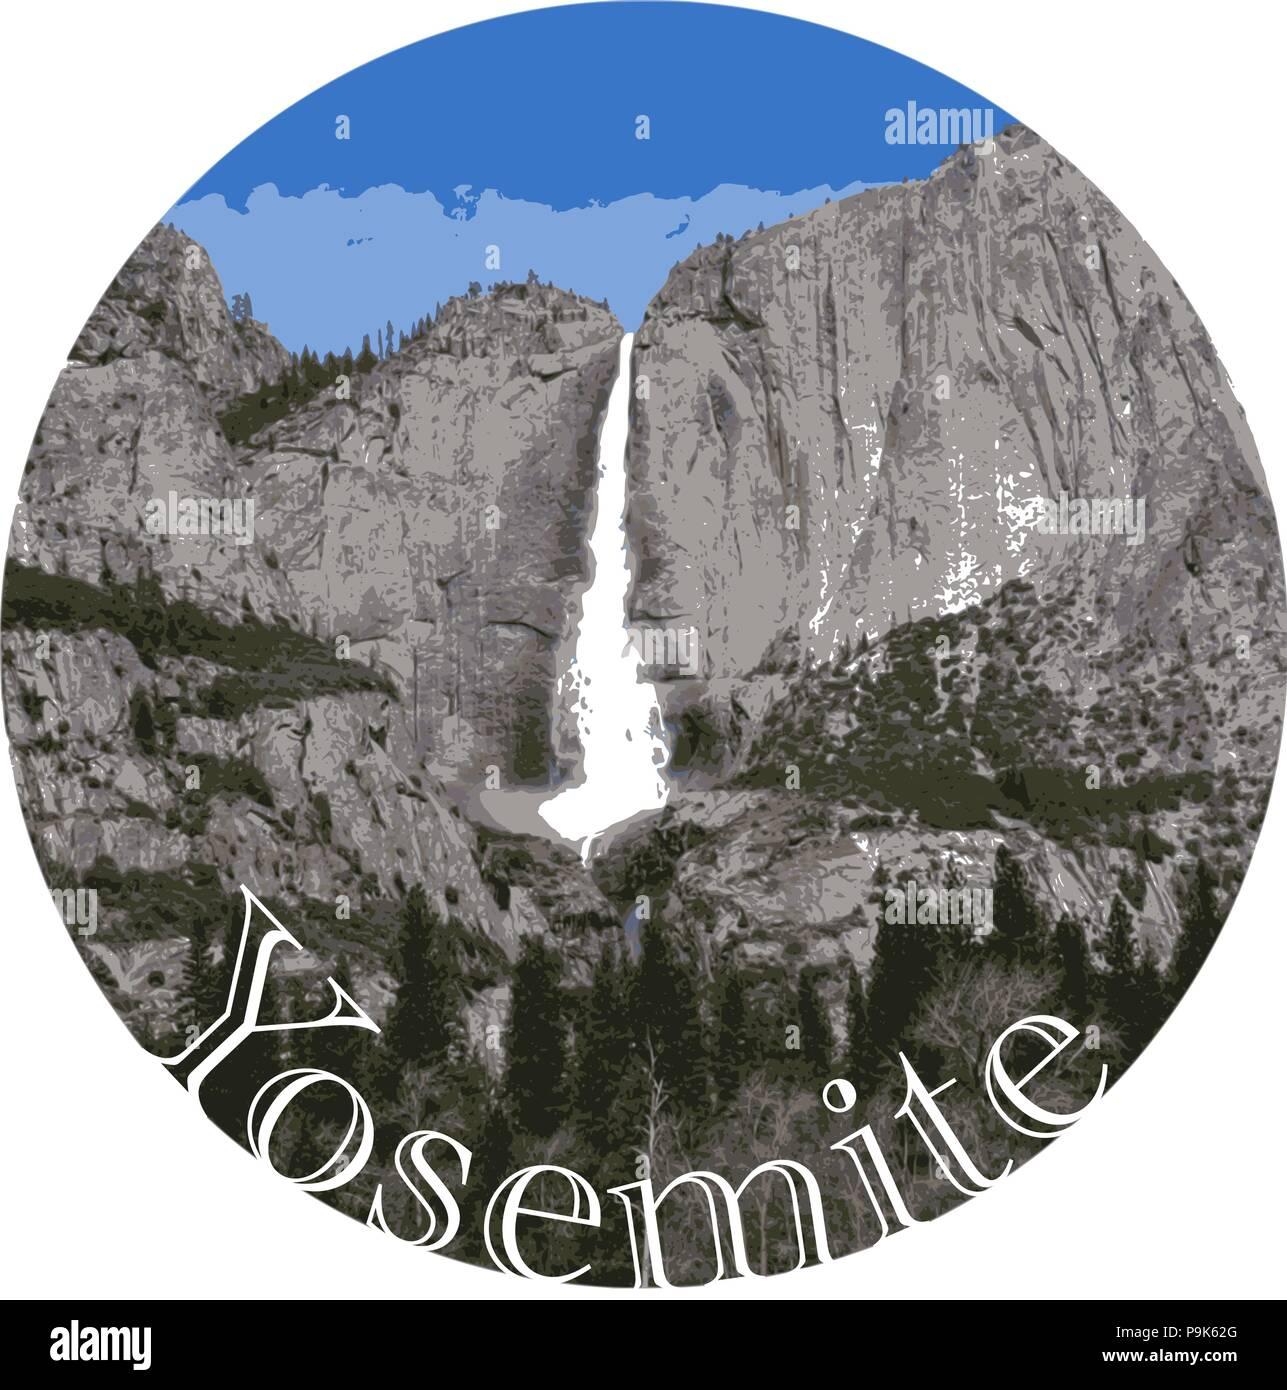 Yosemite Waterfall, US National Park, California - Detailed Vector Graphic, Bumper Sticker Idea - Stock Vector